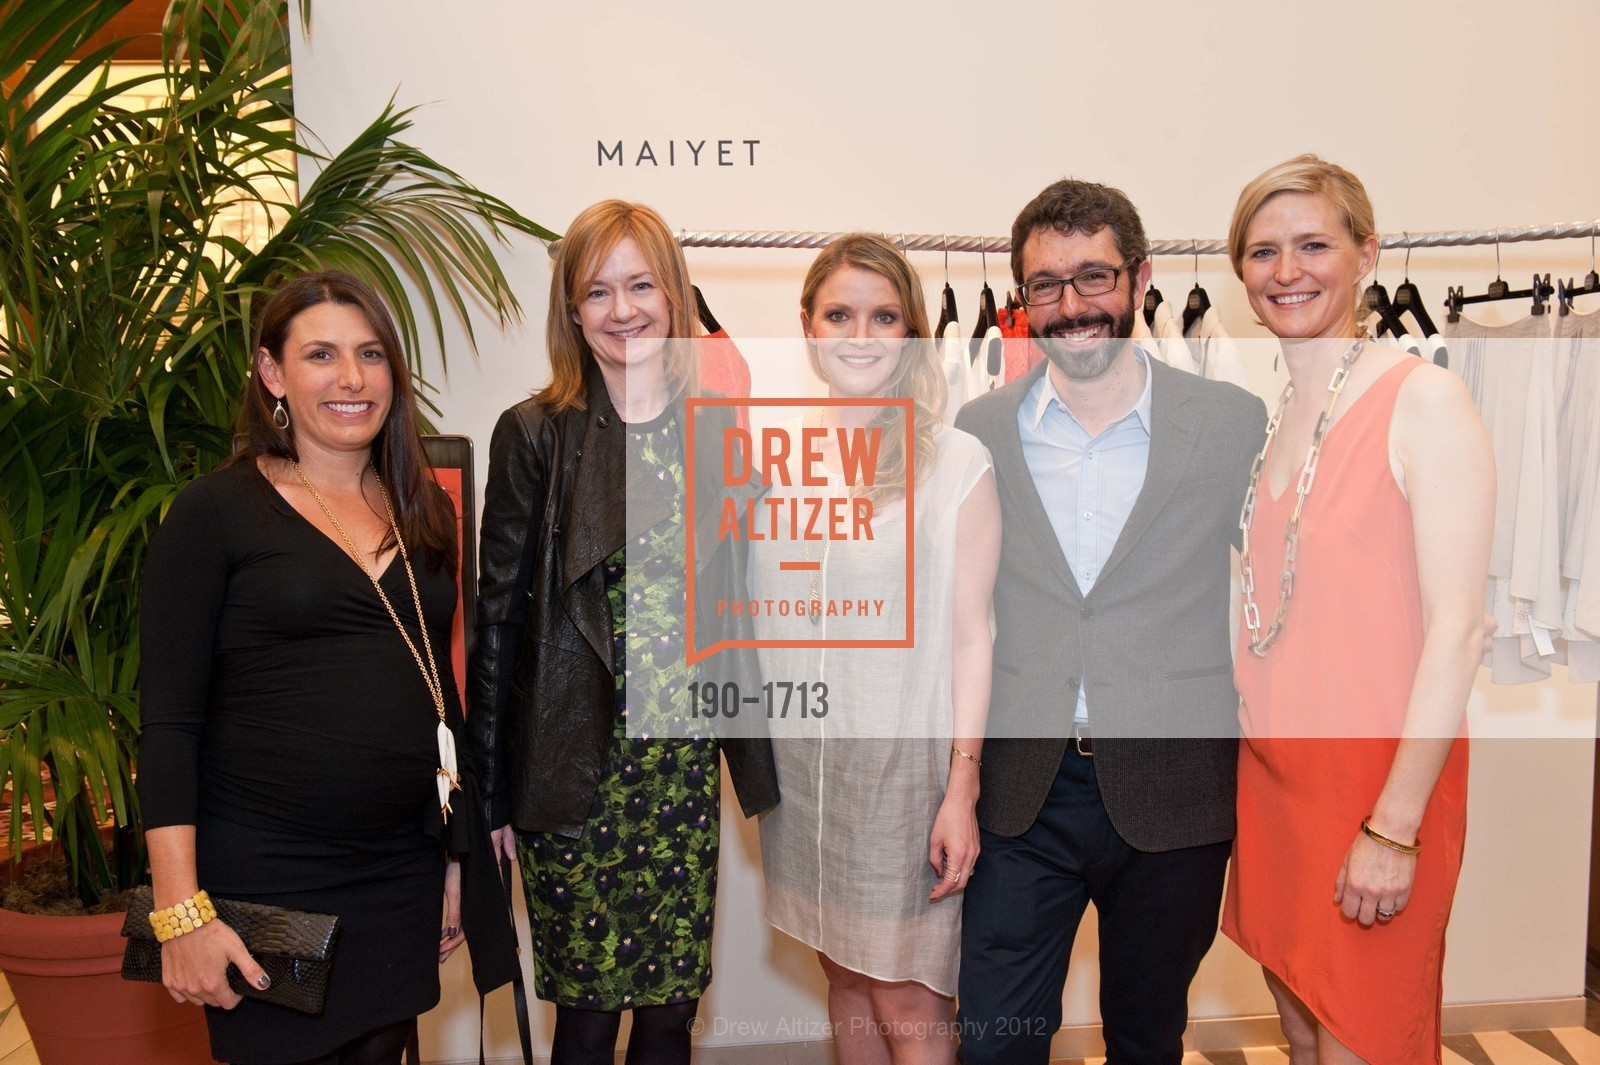 Julie Meyer, Katie Page, Kristy Caylor, Paul van Zyl, Alicia Engstrom, Photo #190-1713